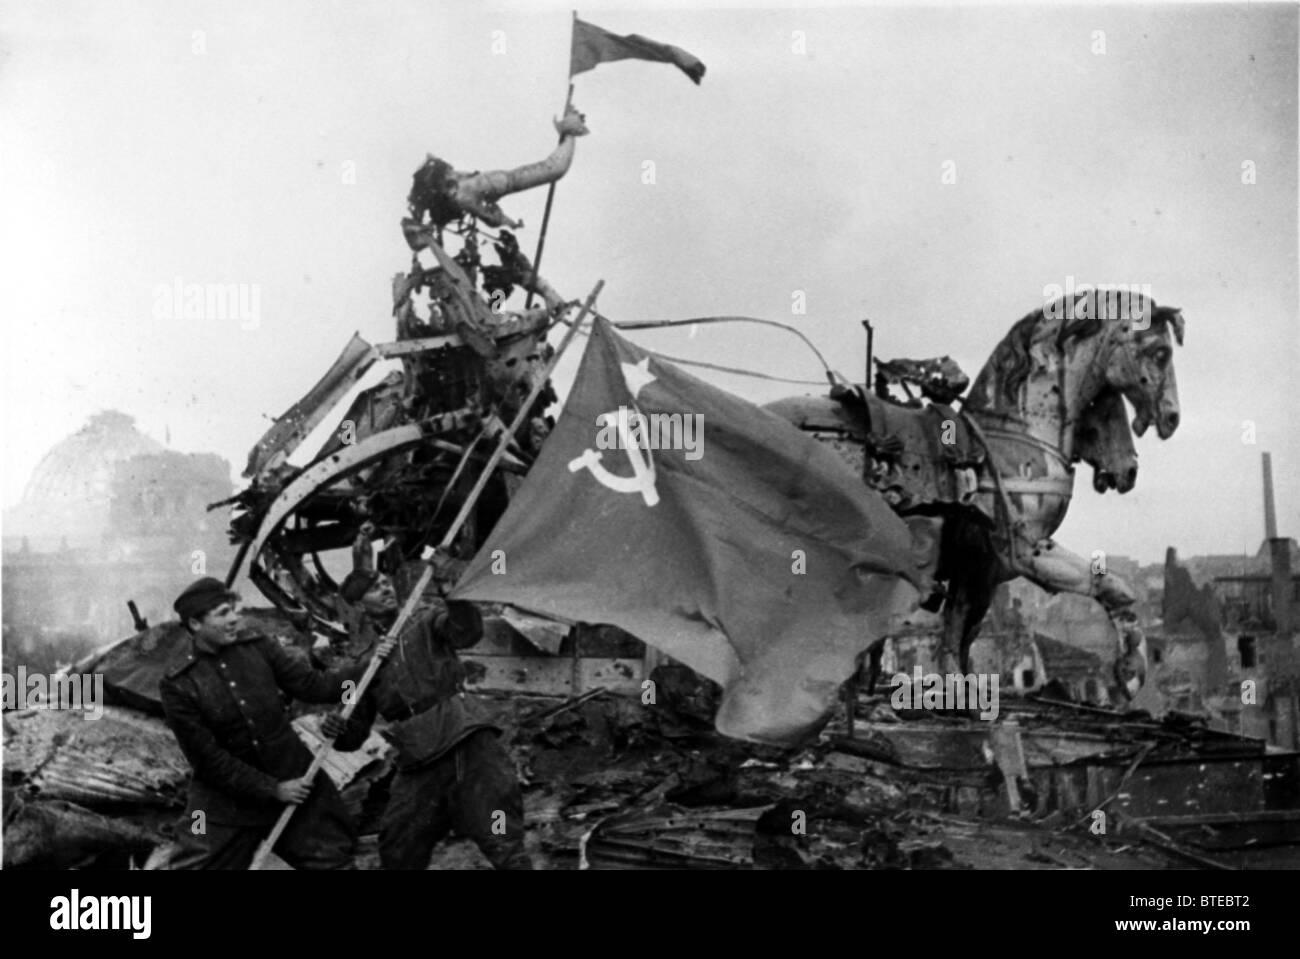 Great Patriotic War. Berlin, 1945 - Stock Image